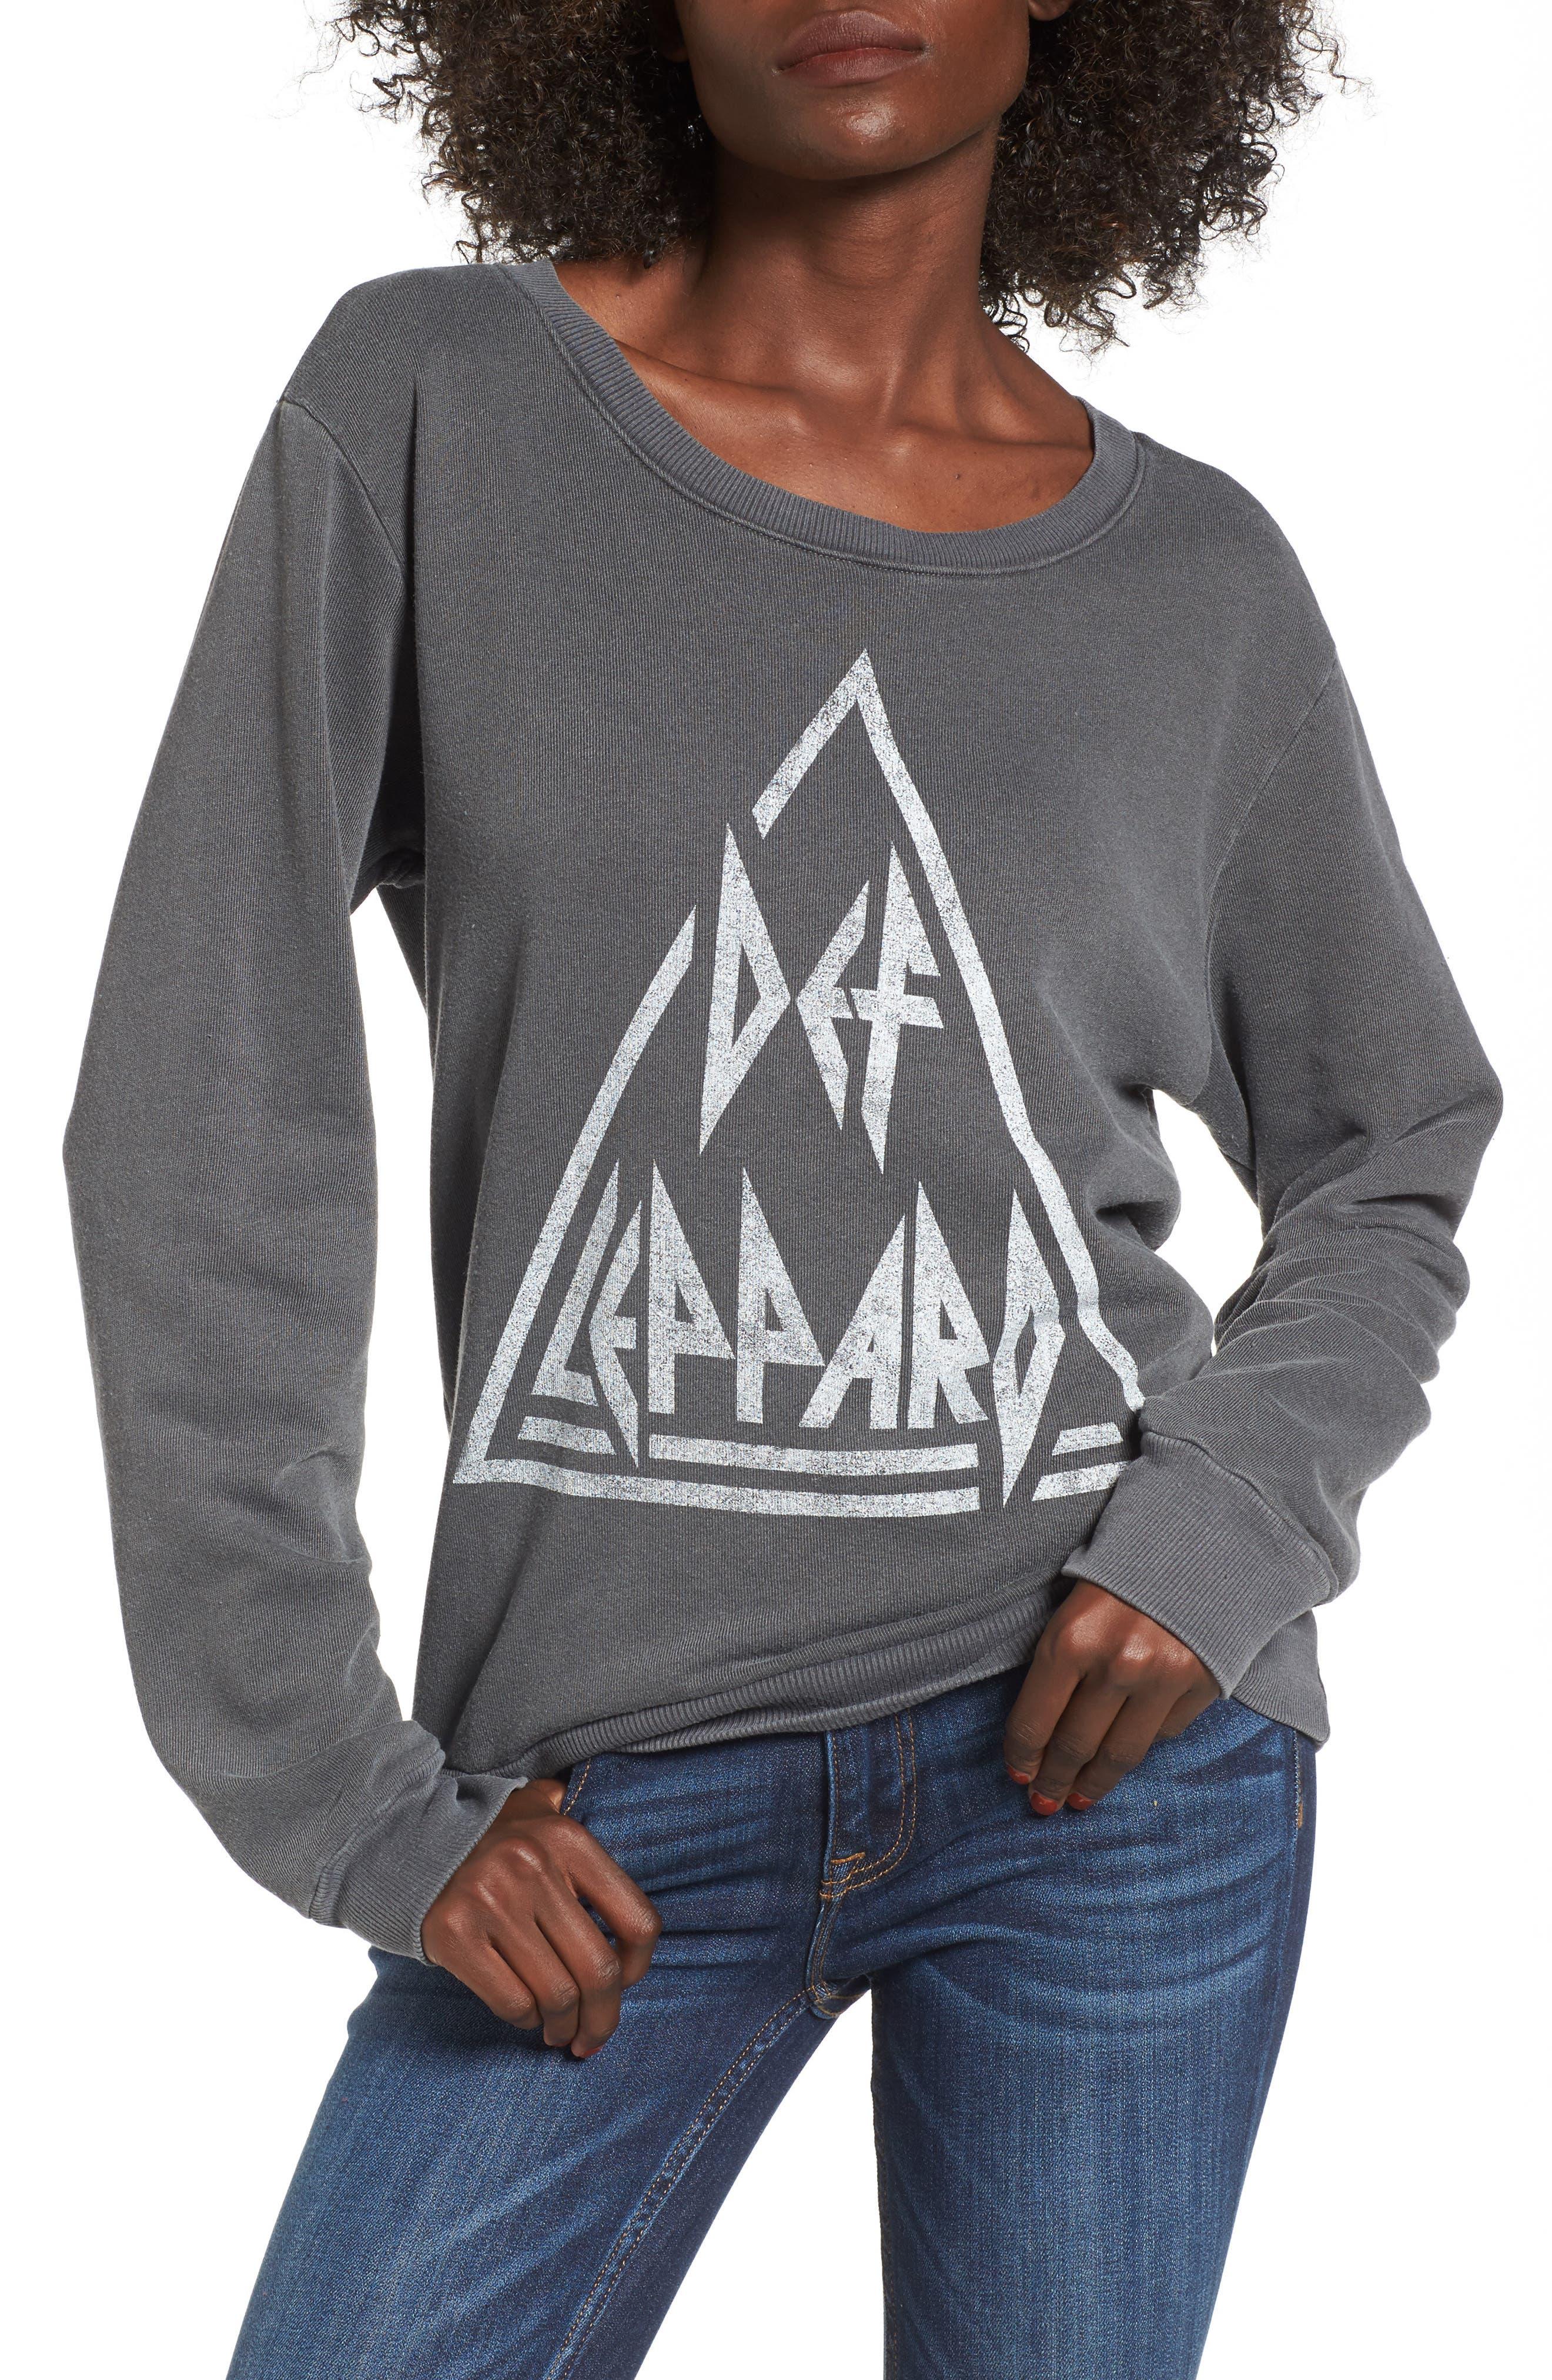 Def Leppard Sweatshirt,                             Main thumbnail 1, color,